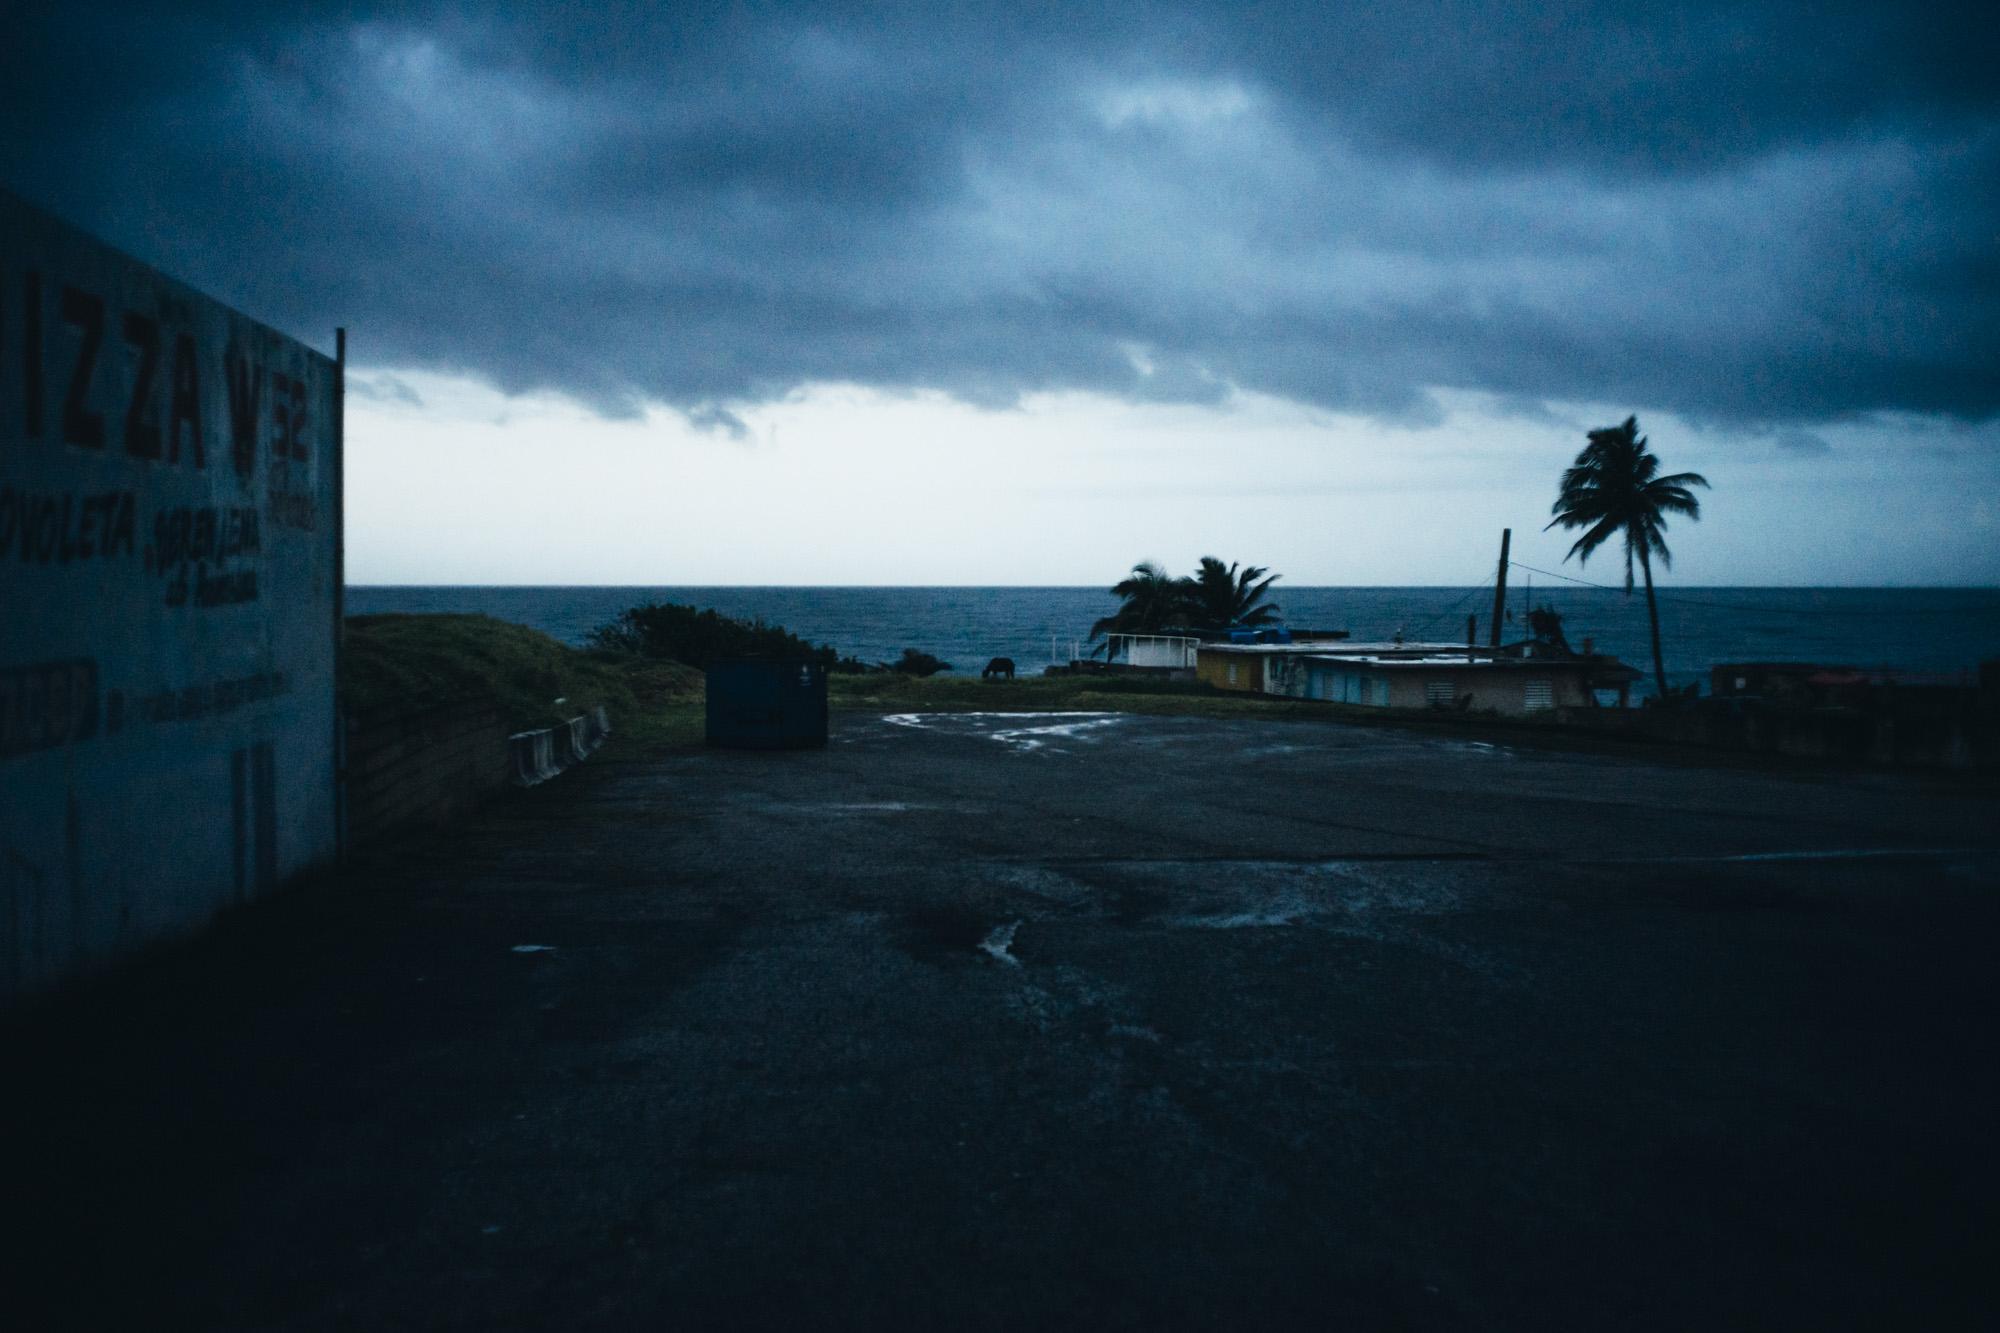 Ocean Lot, PR 2018 - Taliesin Gilkes-Bower